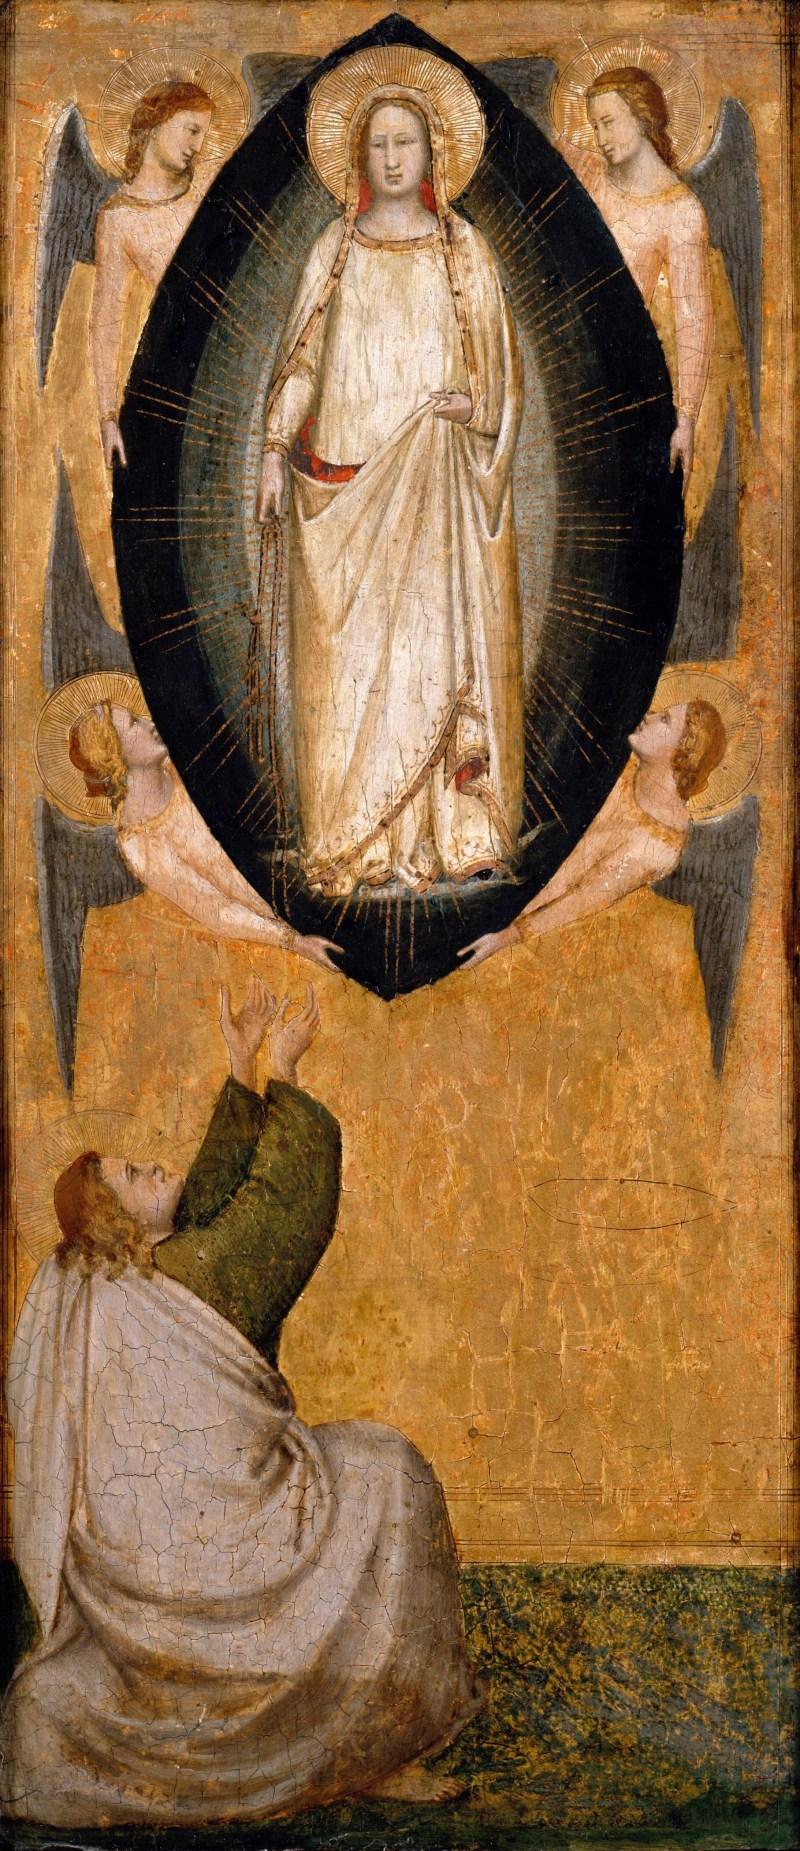 Descent of Mary's Girdle to the Apostle Thomas, by Maso di Banco